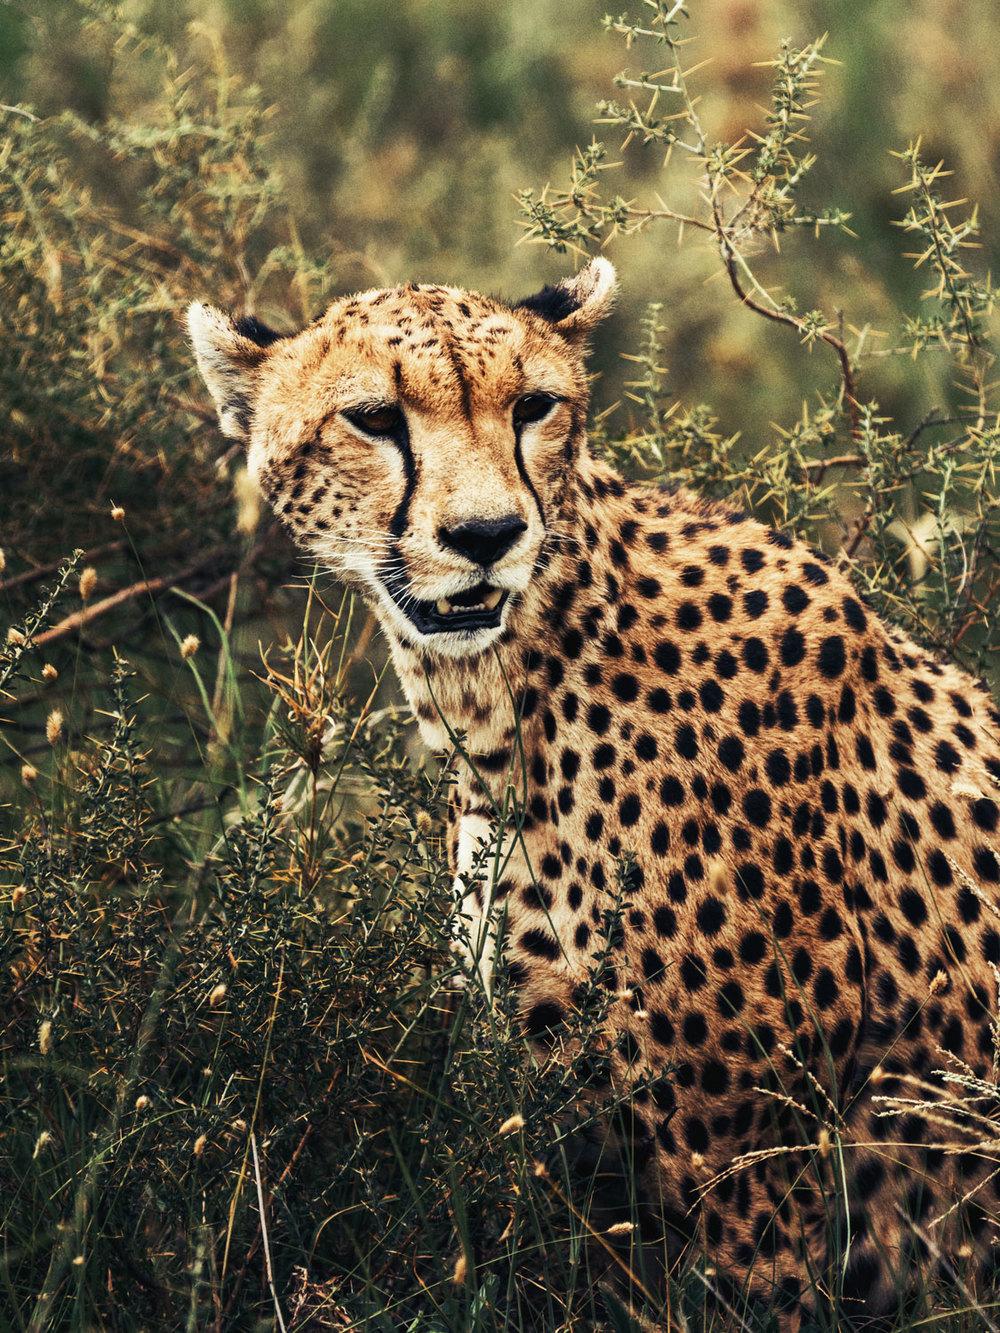 CallieGiovanna_Africa_Tanzania_Serengeti_20150101_08304.jpg